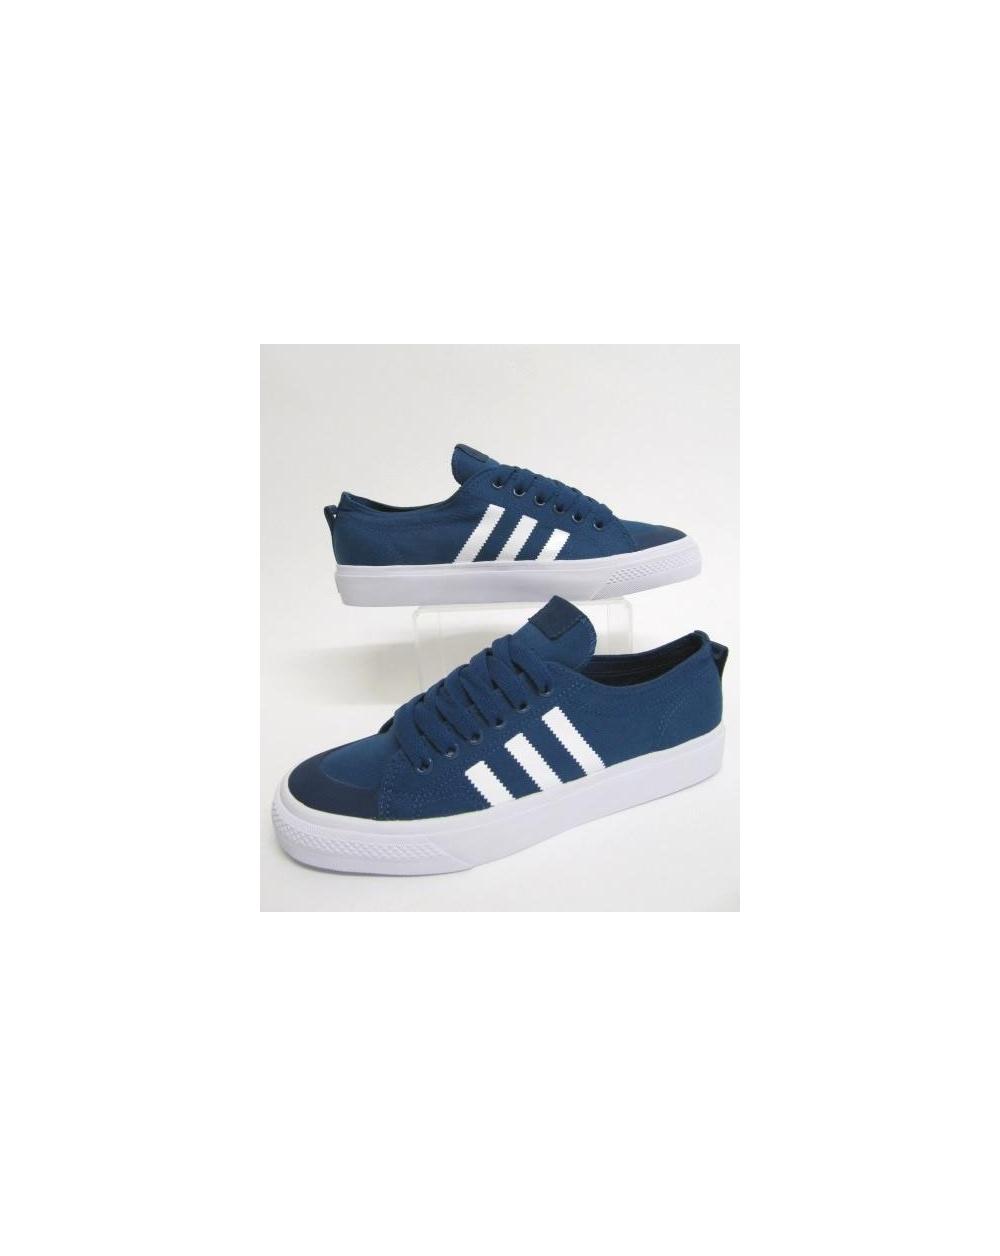 adidas OriginalsNIZZA - Trainers - bright blue/footwear white 6QImSXD